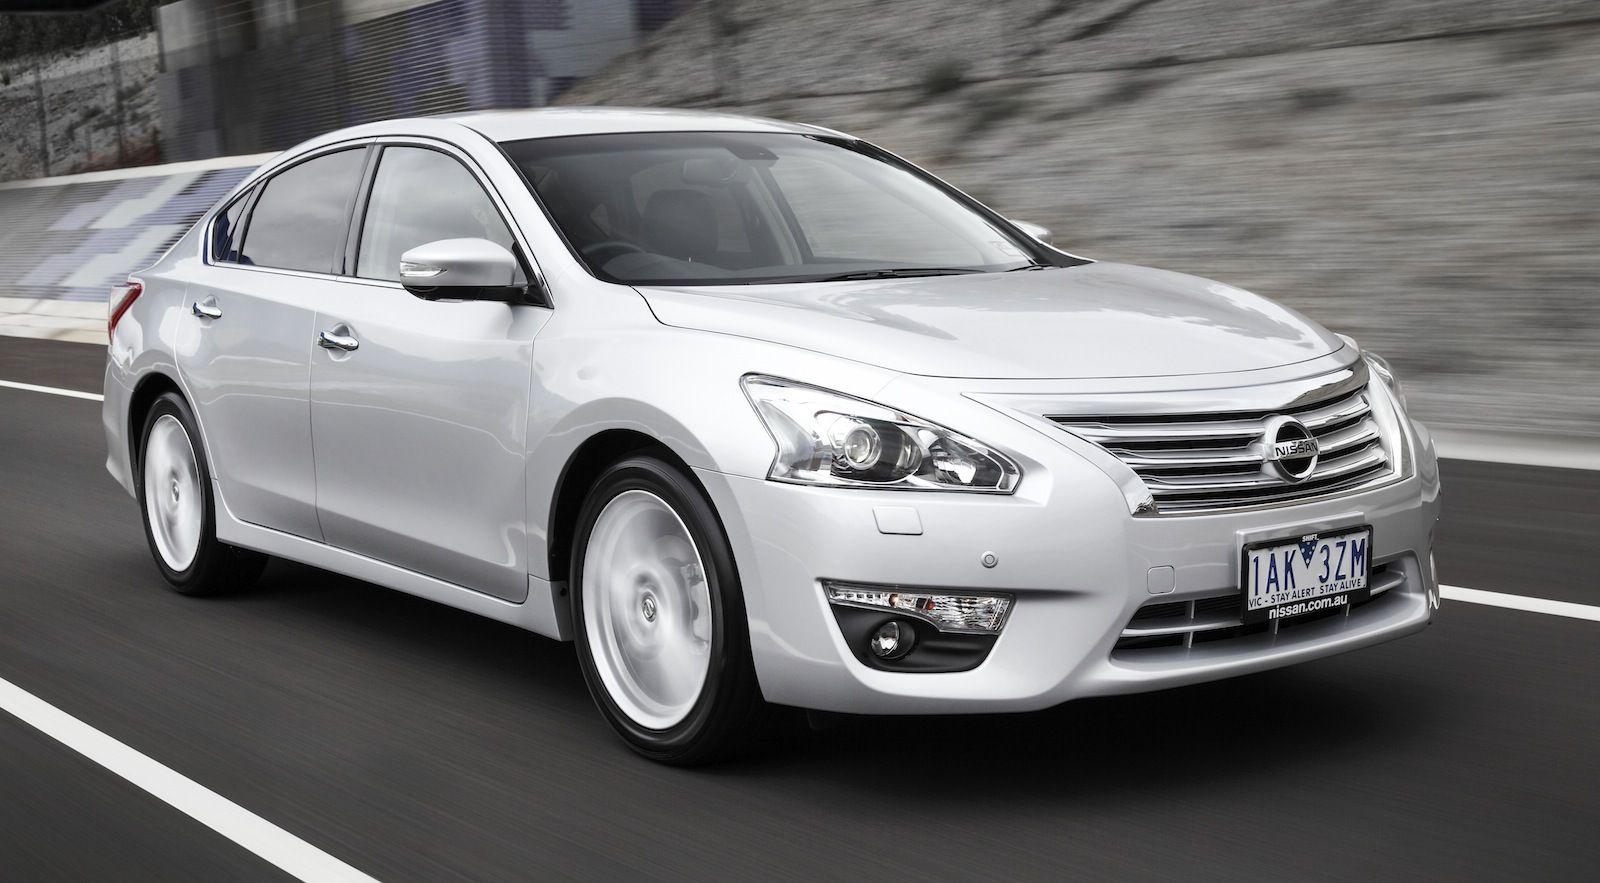 Nissan Altima Nissan altima, Nissan, Fuel economy